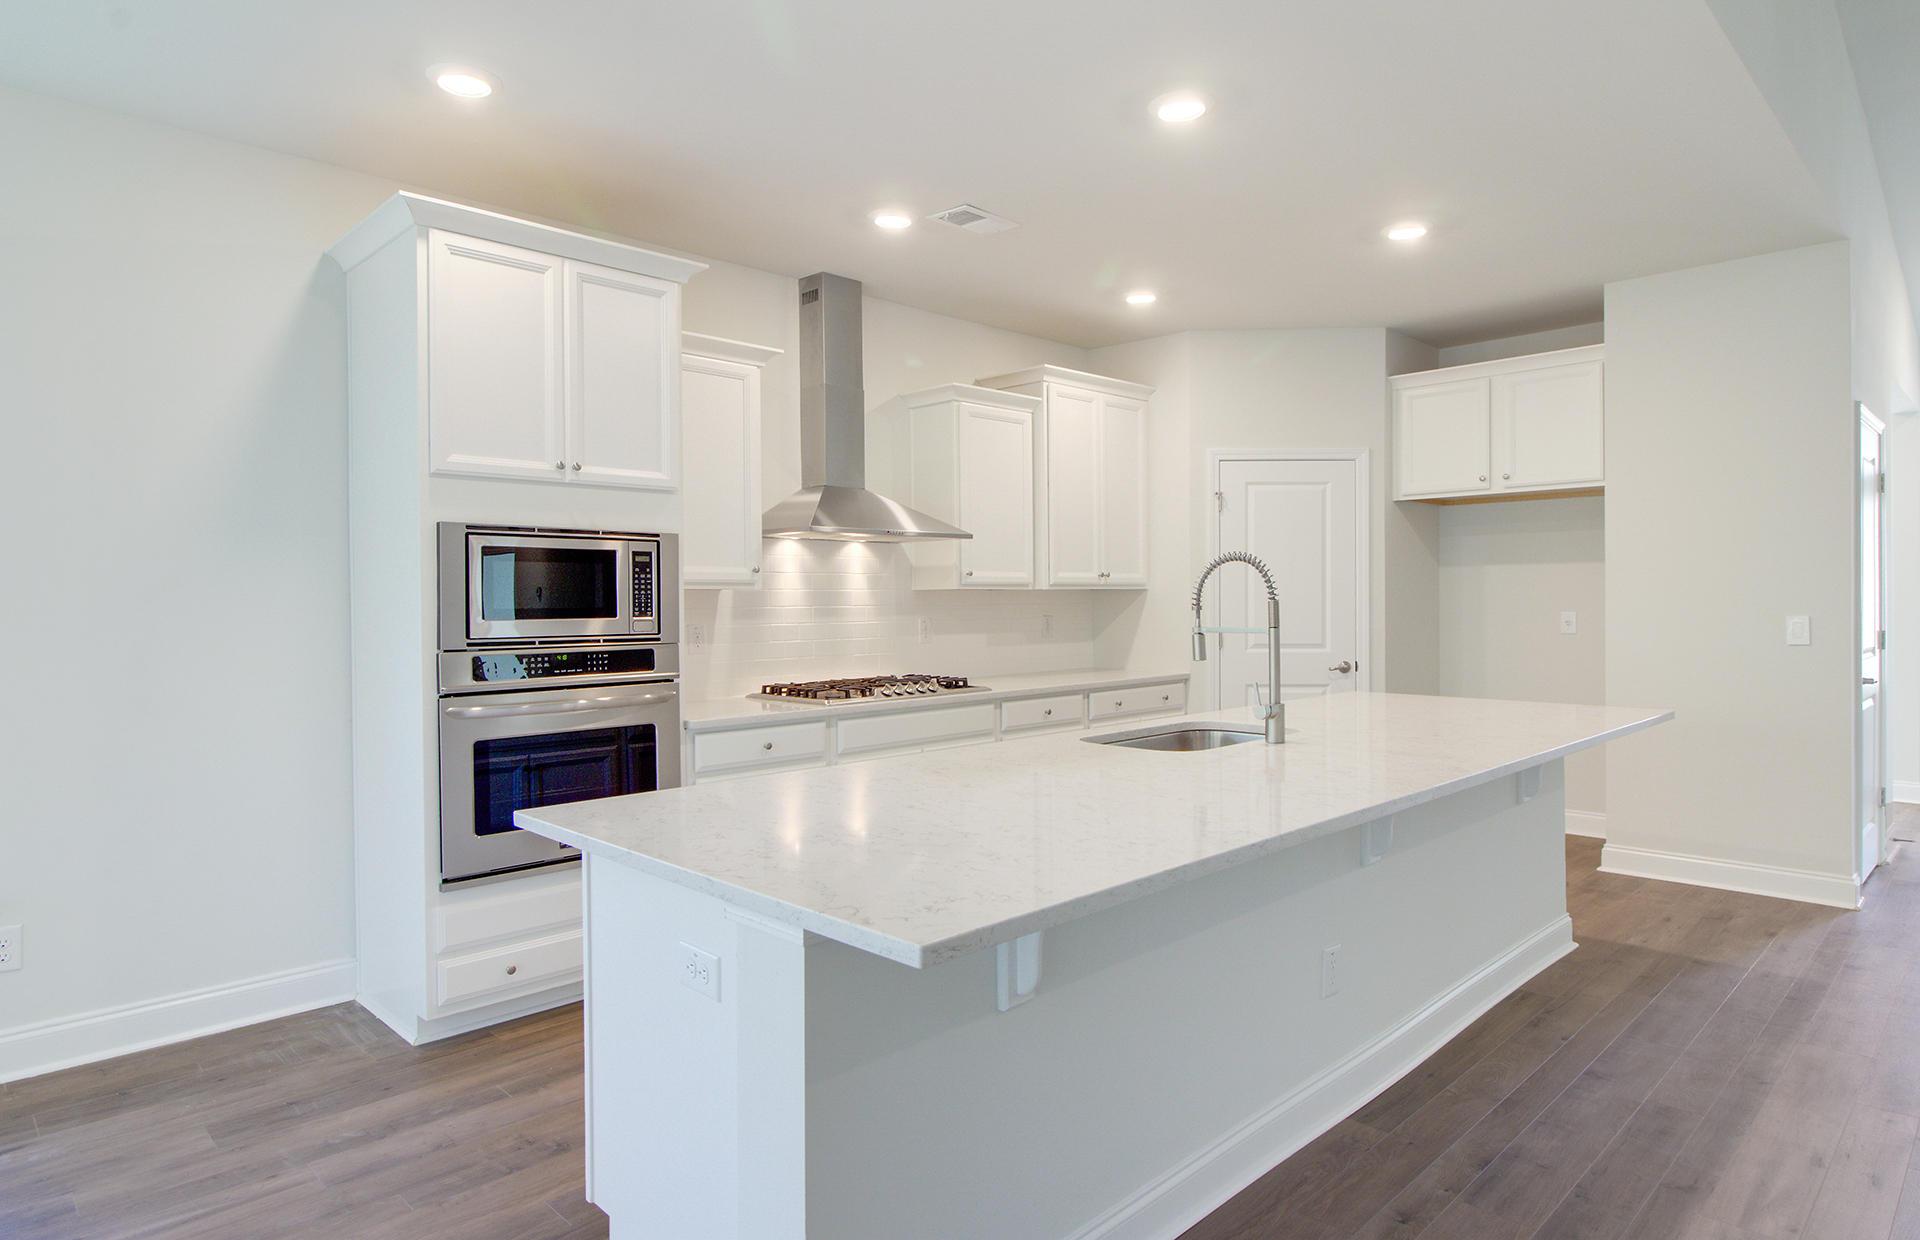 Park West Homes For Sale - 3066 Rice Field, Mount Pleasant, SC - 58